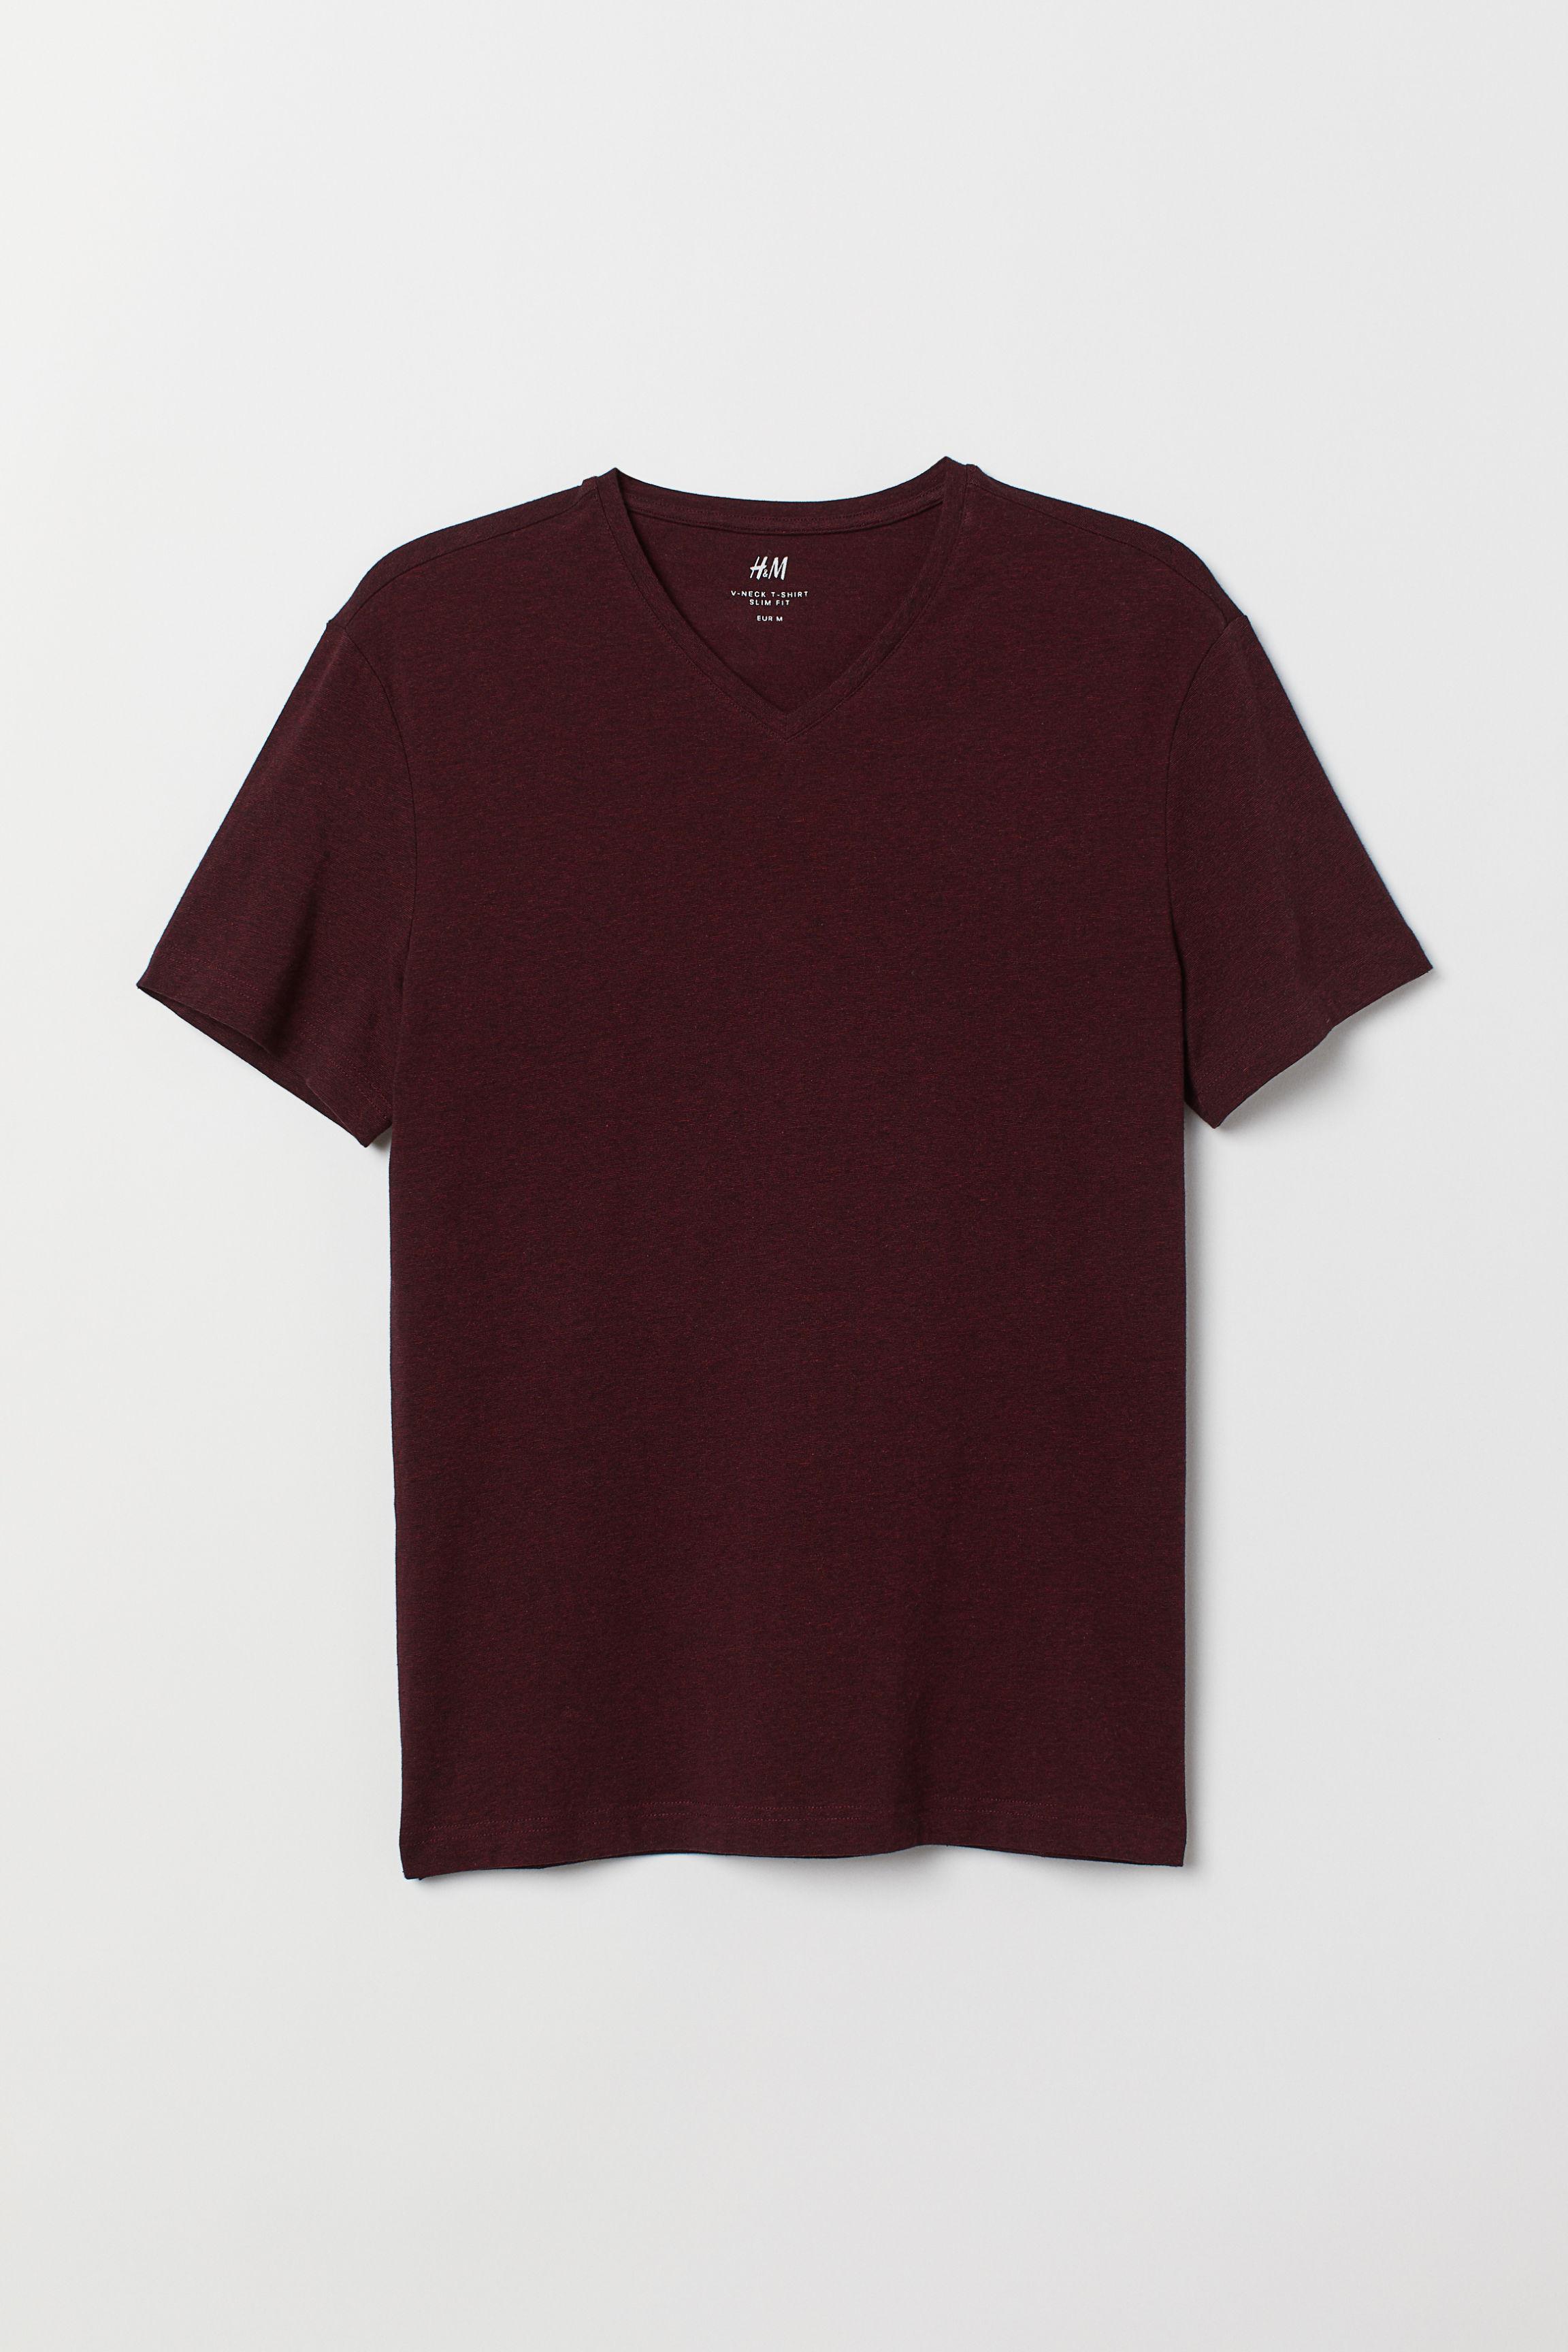 b36e9d61 3-pack T-shirts Slim Fit - Hvit - HERRE | H&M NO